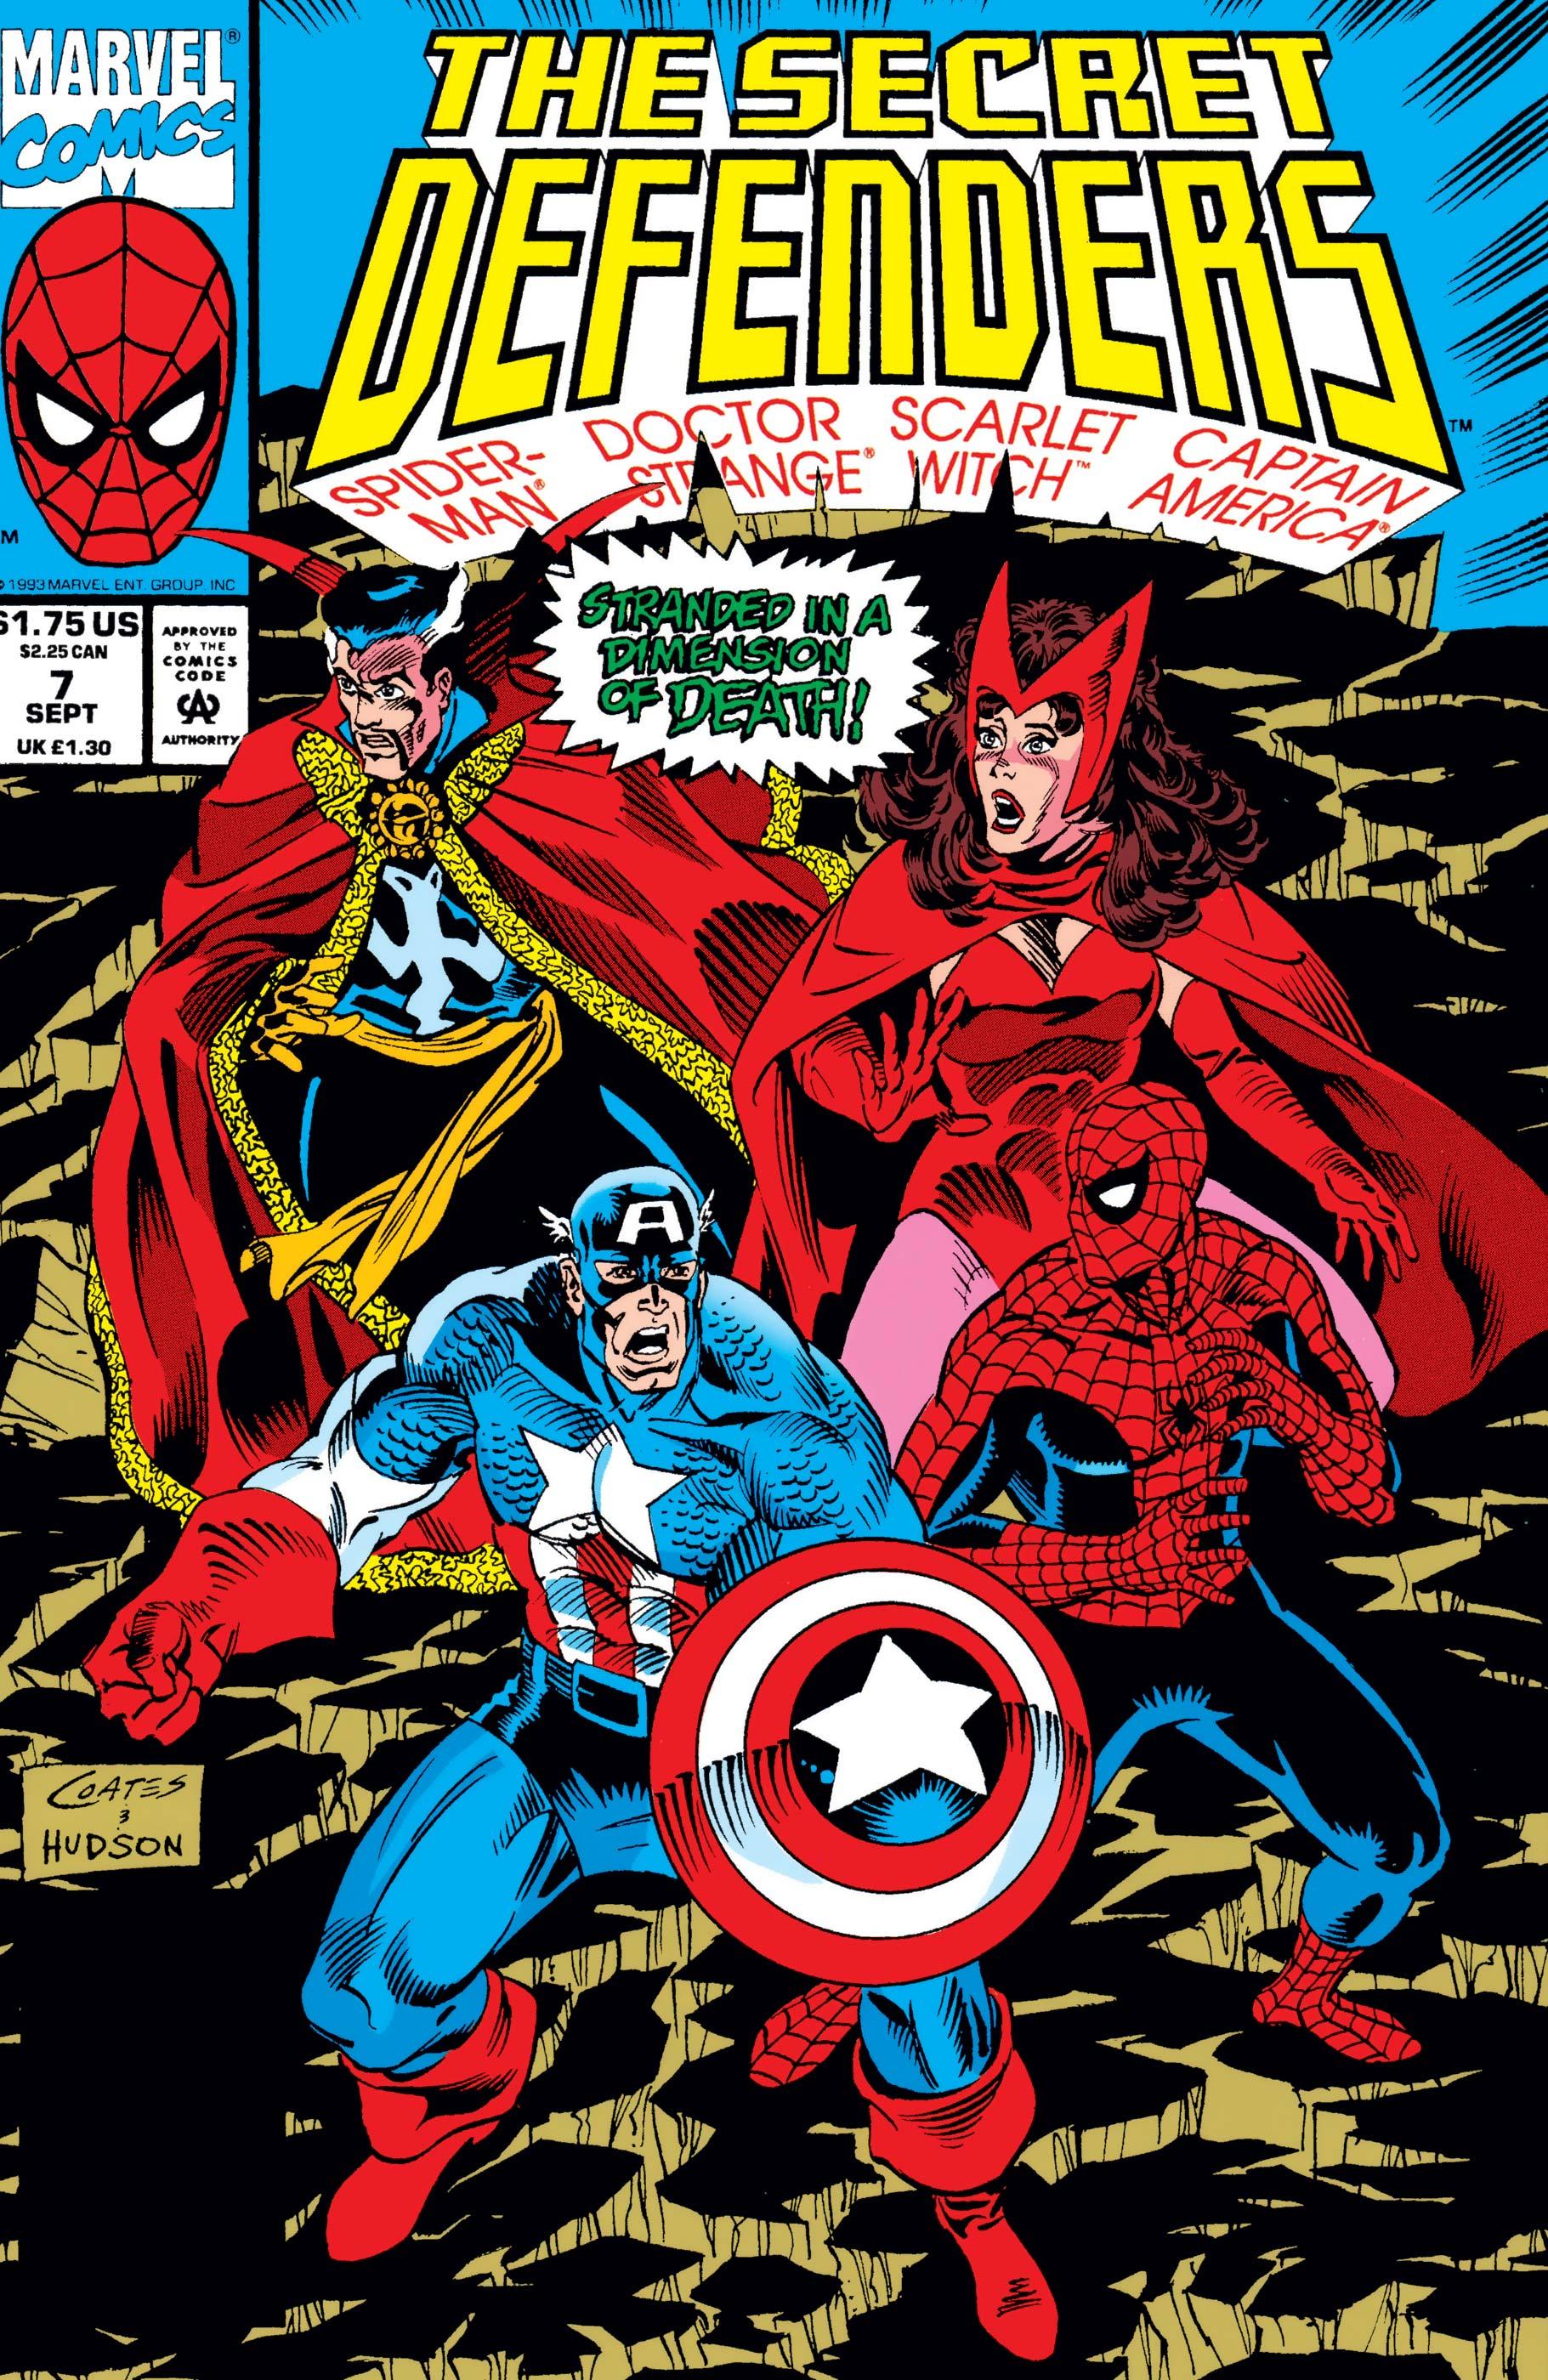 Secret Defenders (1993) #7